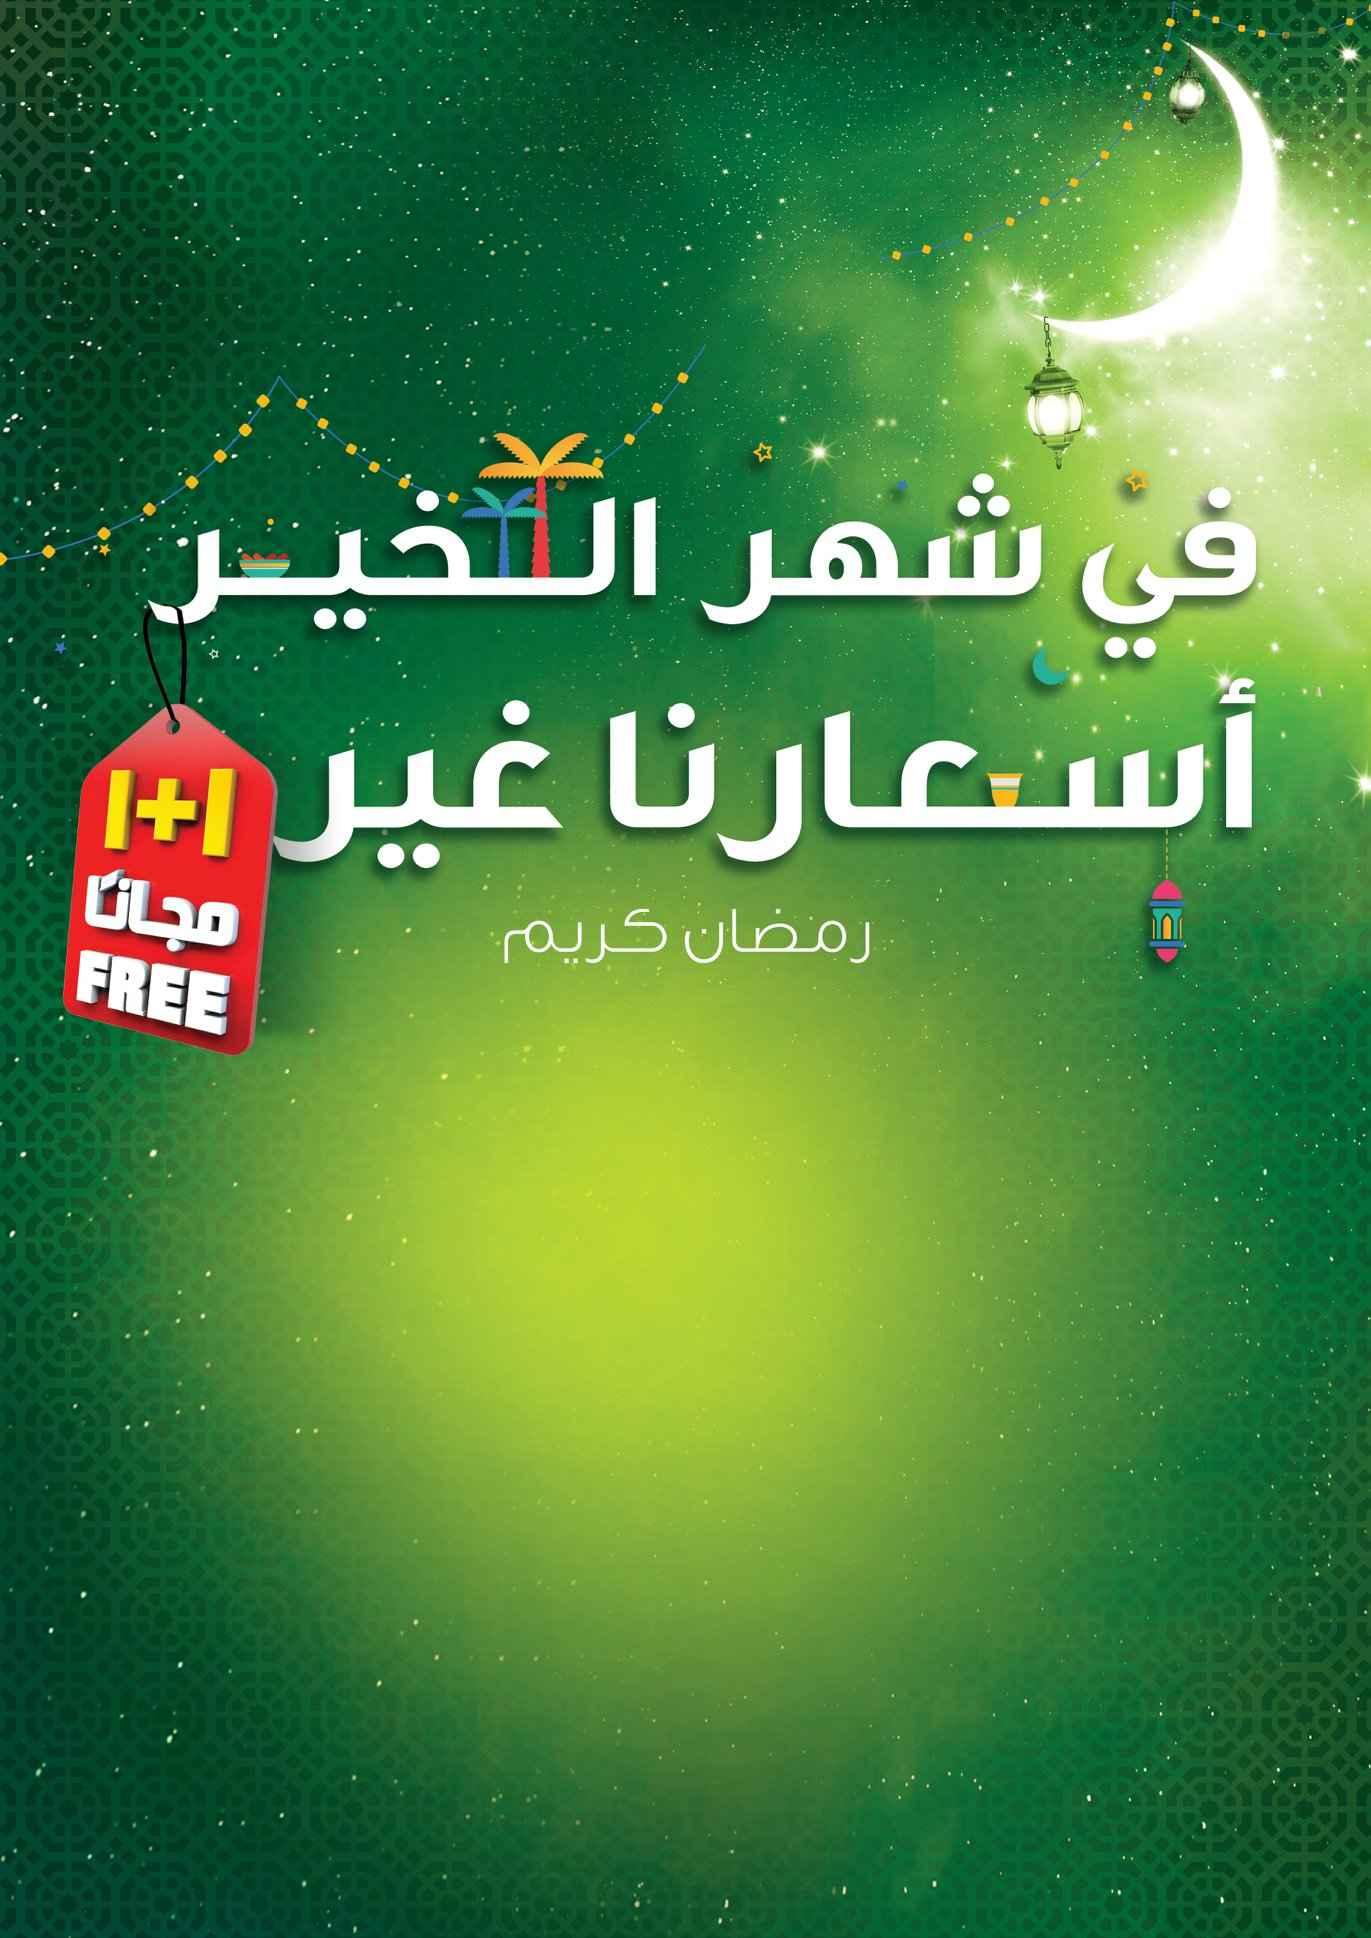 08986207e عروض كارفور السعودية الاربعاء 17 ابريل 2019-عروض الاسبوع الجديدة